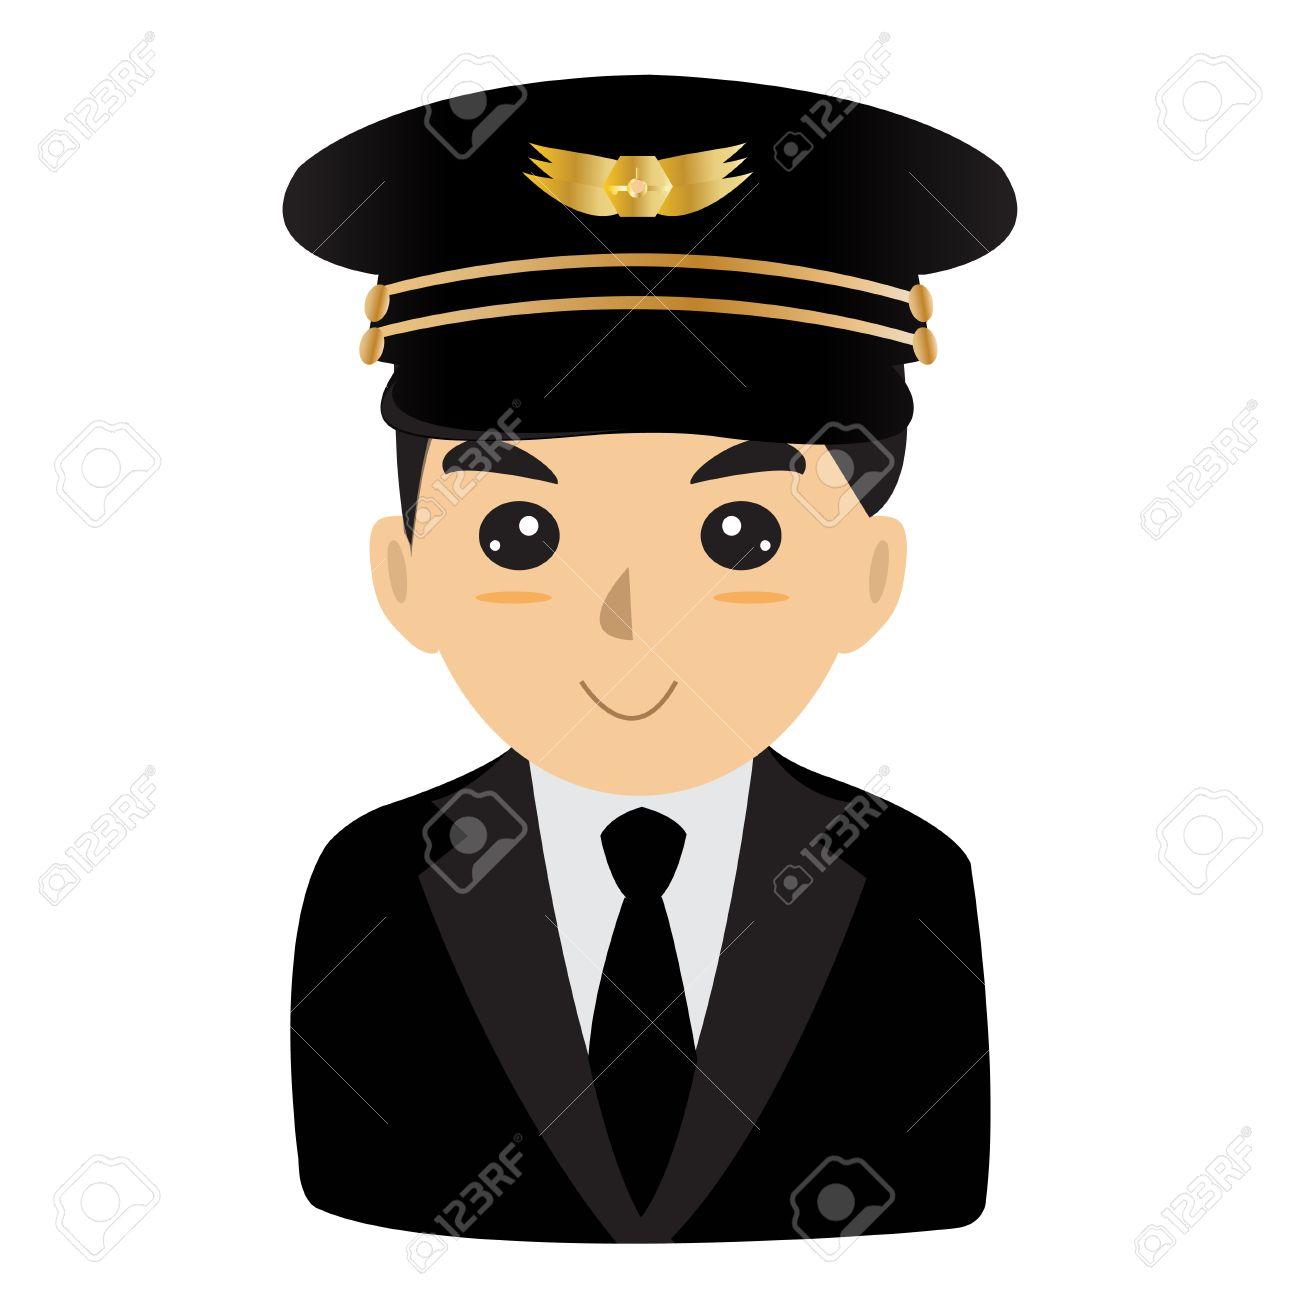 Aviator pilot flyer airman design illustration.